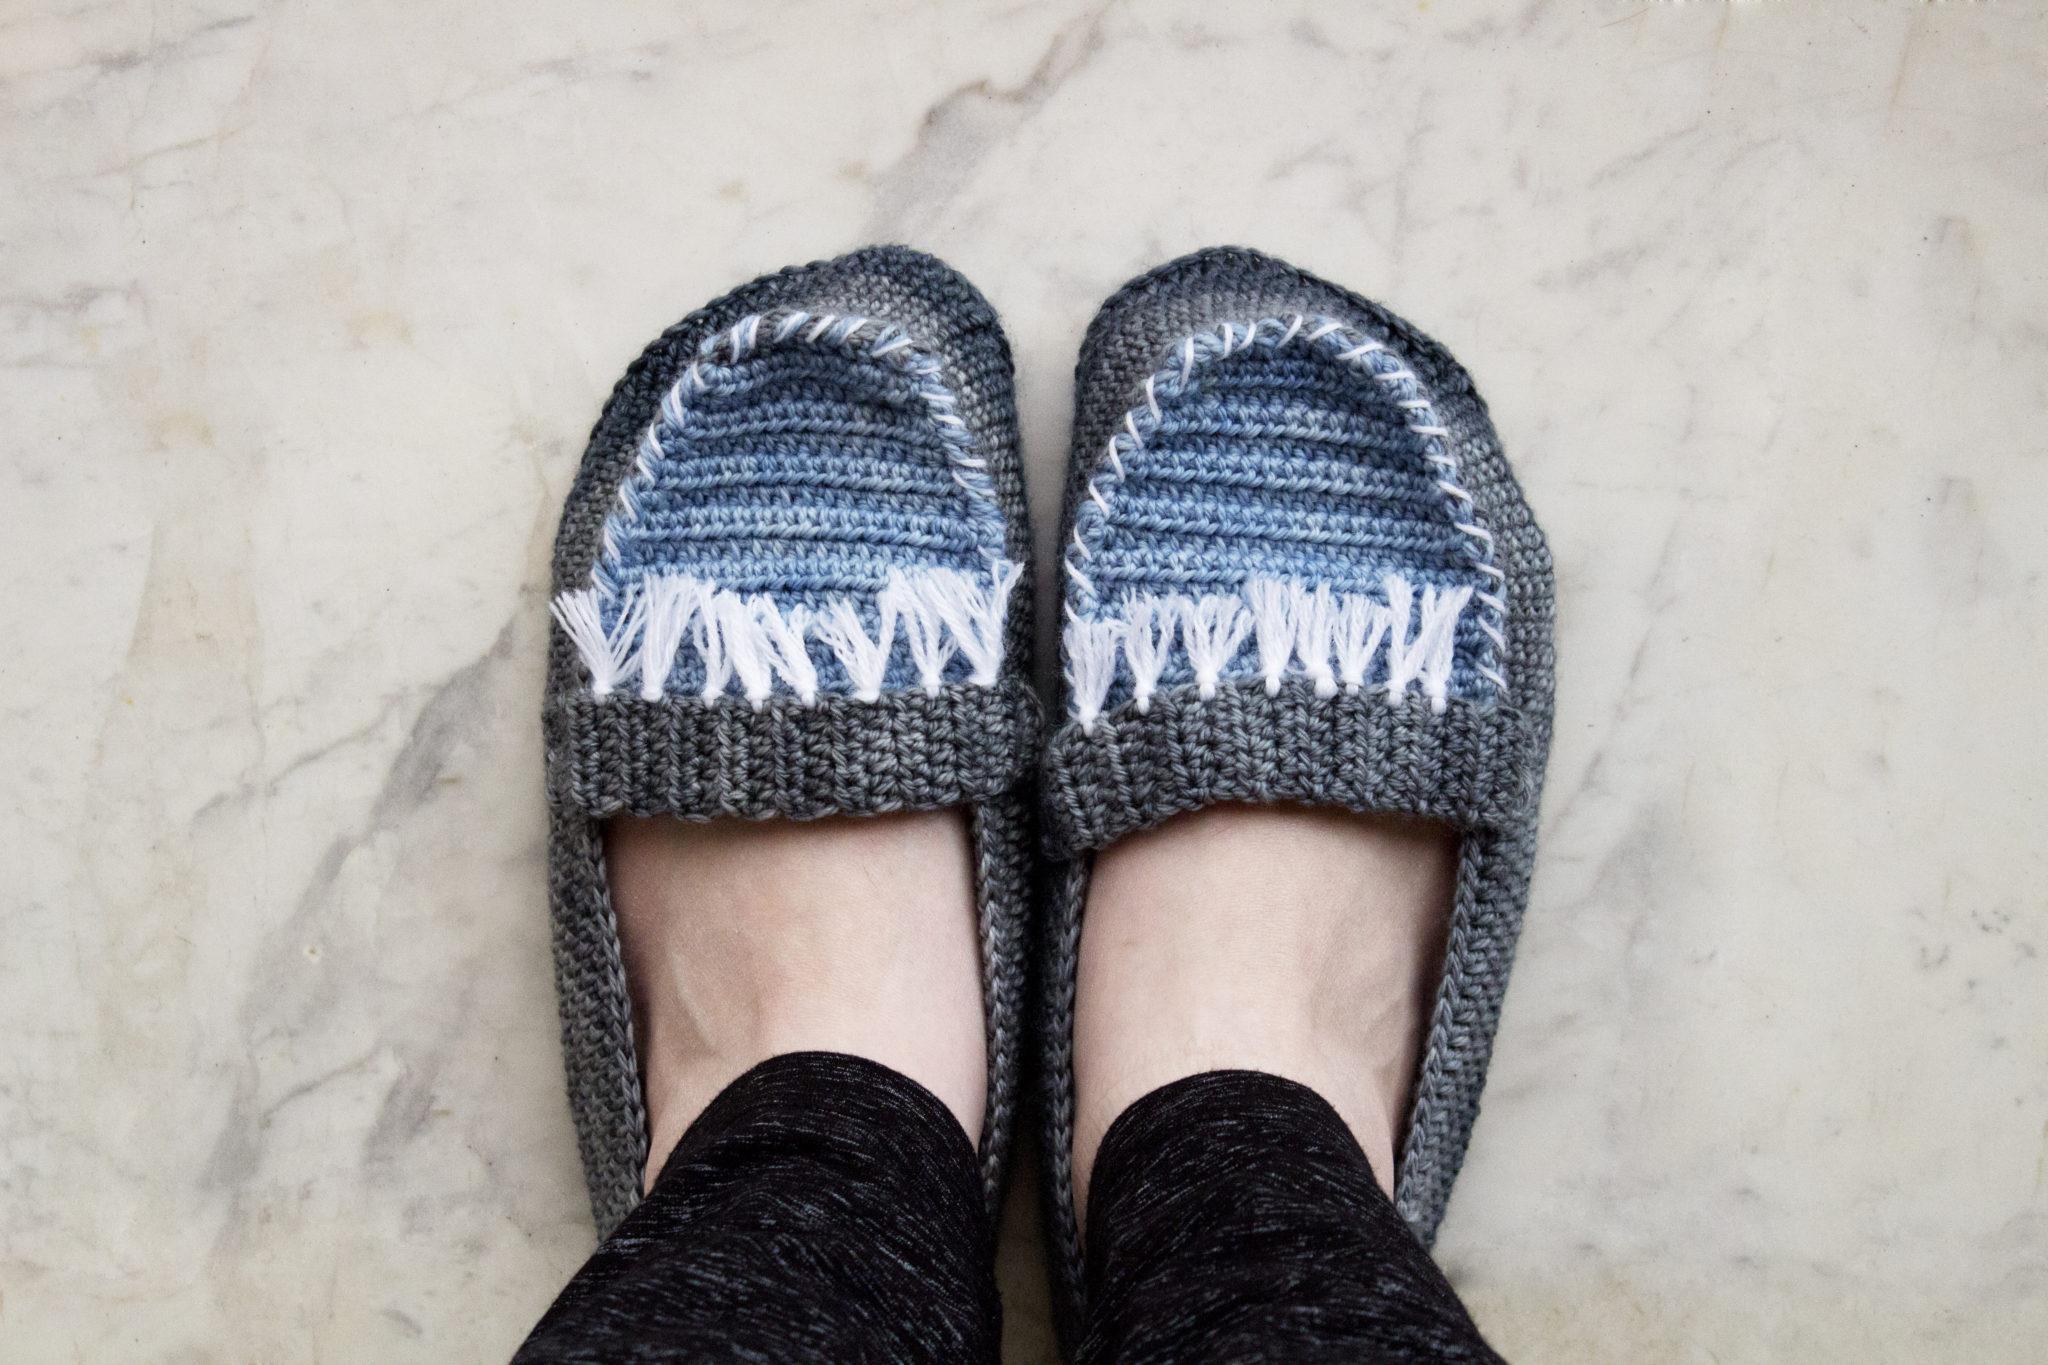 c9776fb37329 Moccasin slippers crochet pattern